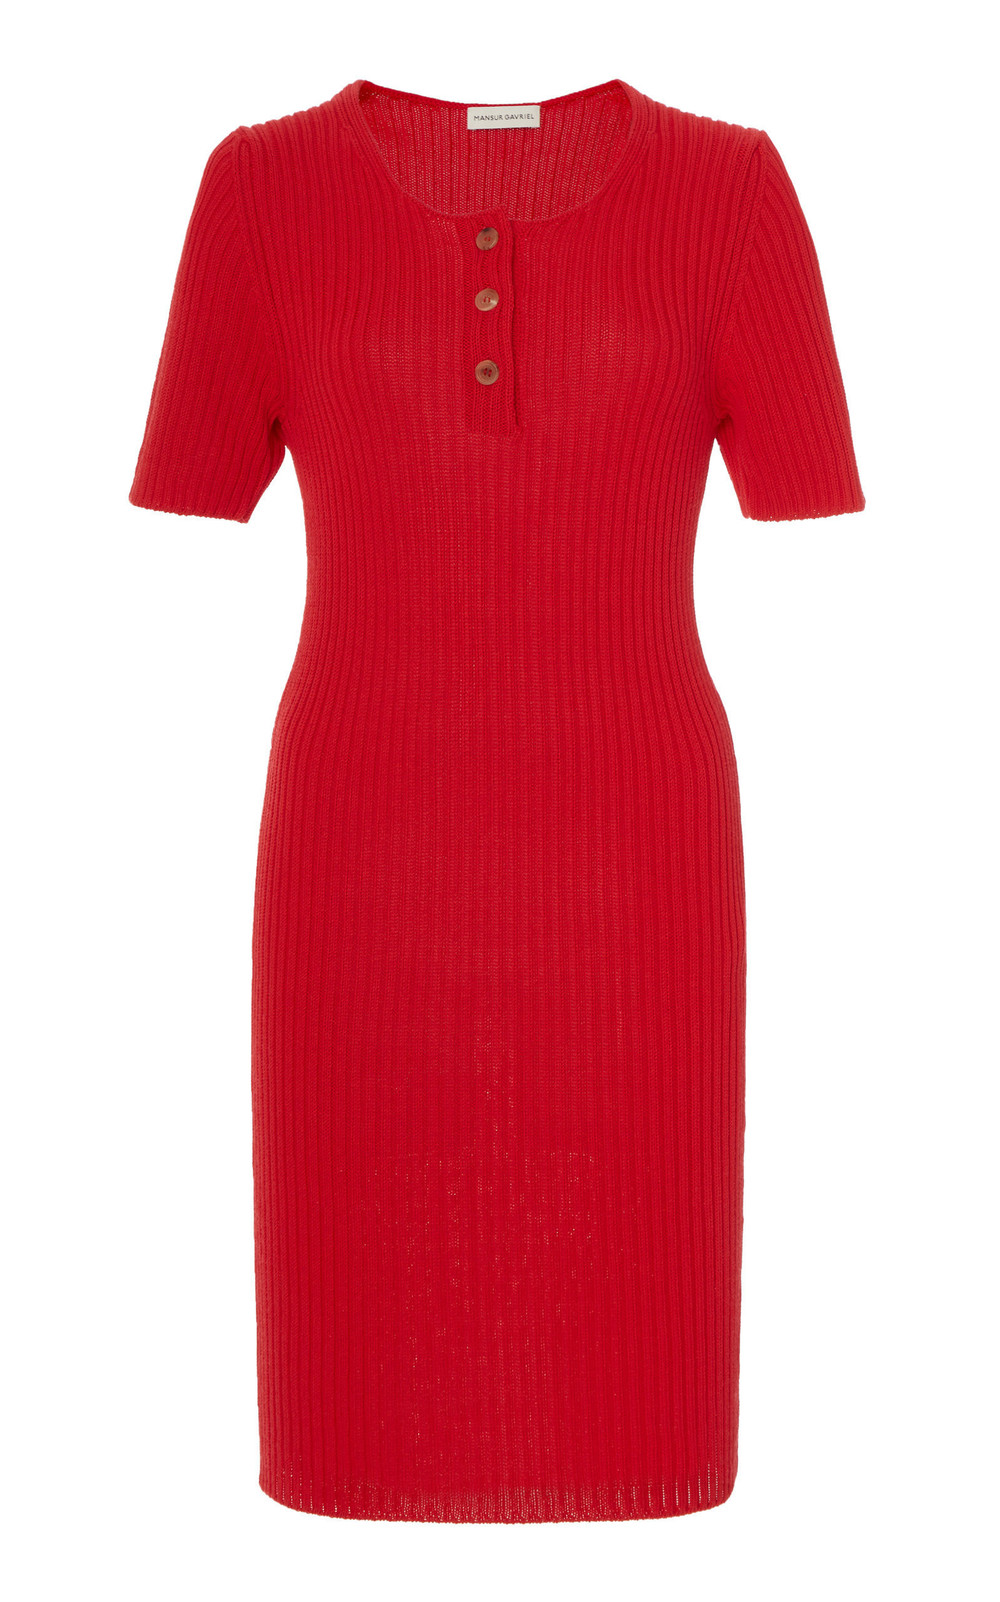 Mansur Gavriel Rib-Knit Cotton-Blend Mini Dress in red